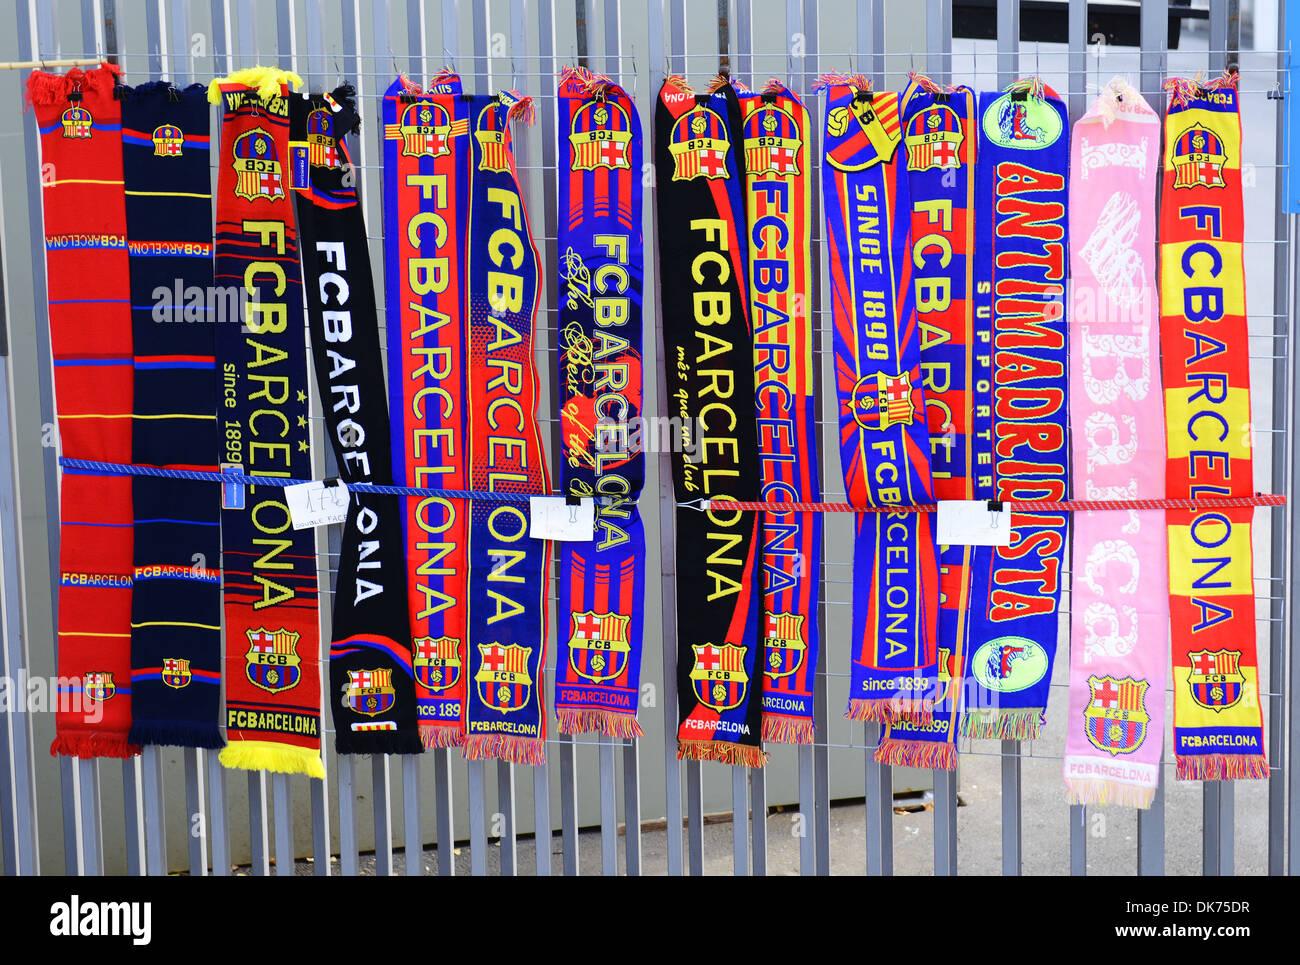 Barcelona football club scarfs for sale, Barcelona, Spain - Stock Image